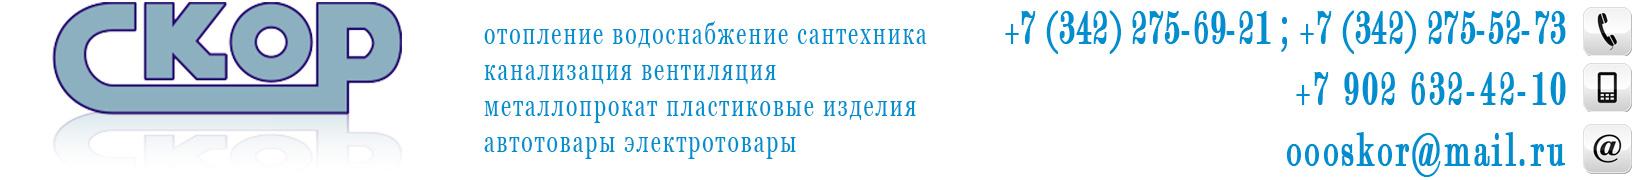 Интернет-магазин СКОР